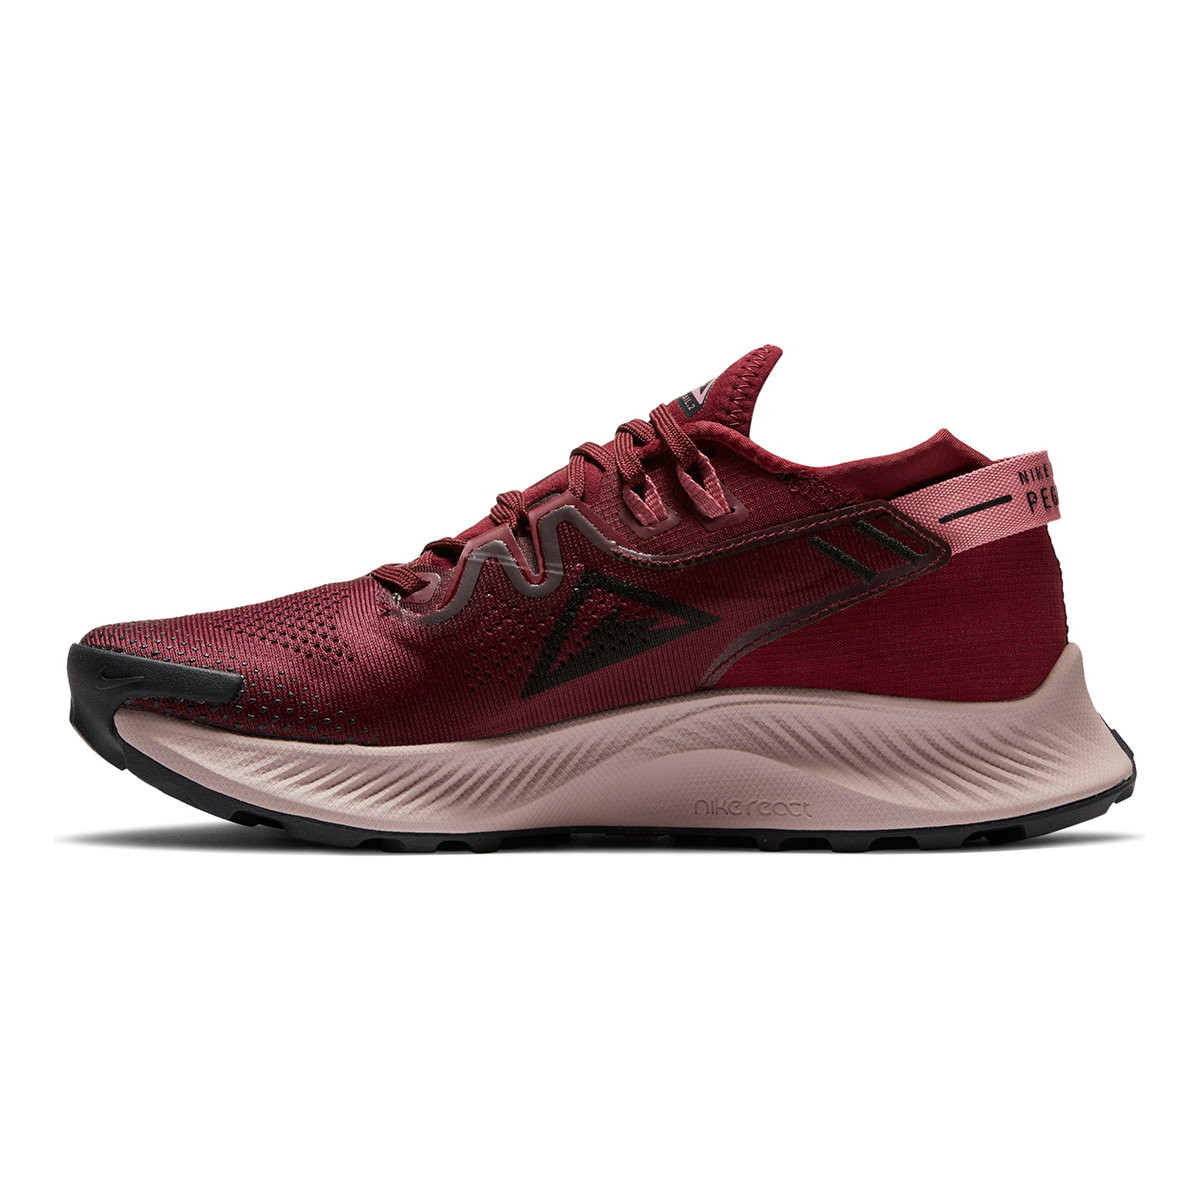 Women's Nike Pegasus Trail 2 Trail Running Shoe - Color: Dark Beetroot/Desert Berry/Platinum Tint/Black - Size: 5 - Width: Regular, Dark Beetroot/Desert Berry/Platinum Tint/Black, large, image 4